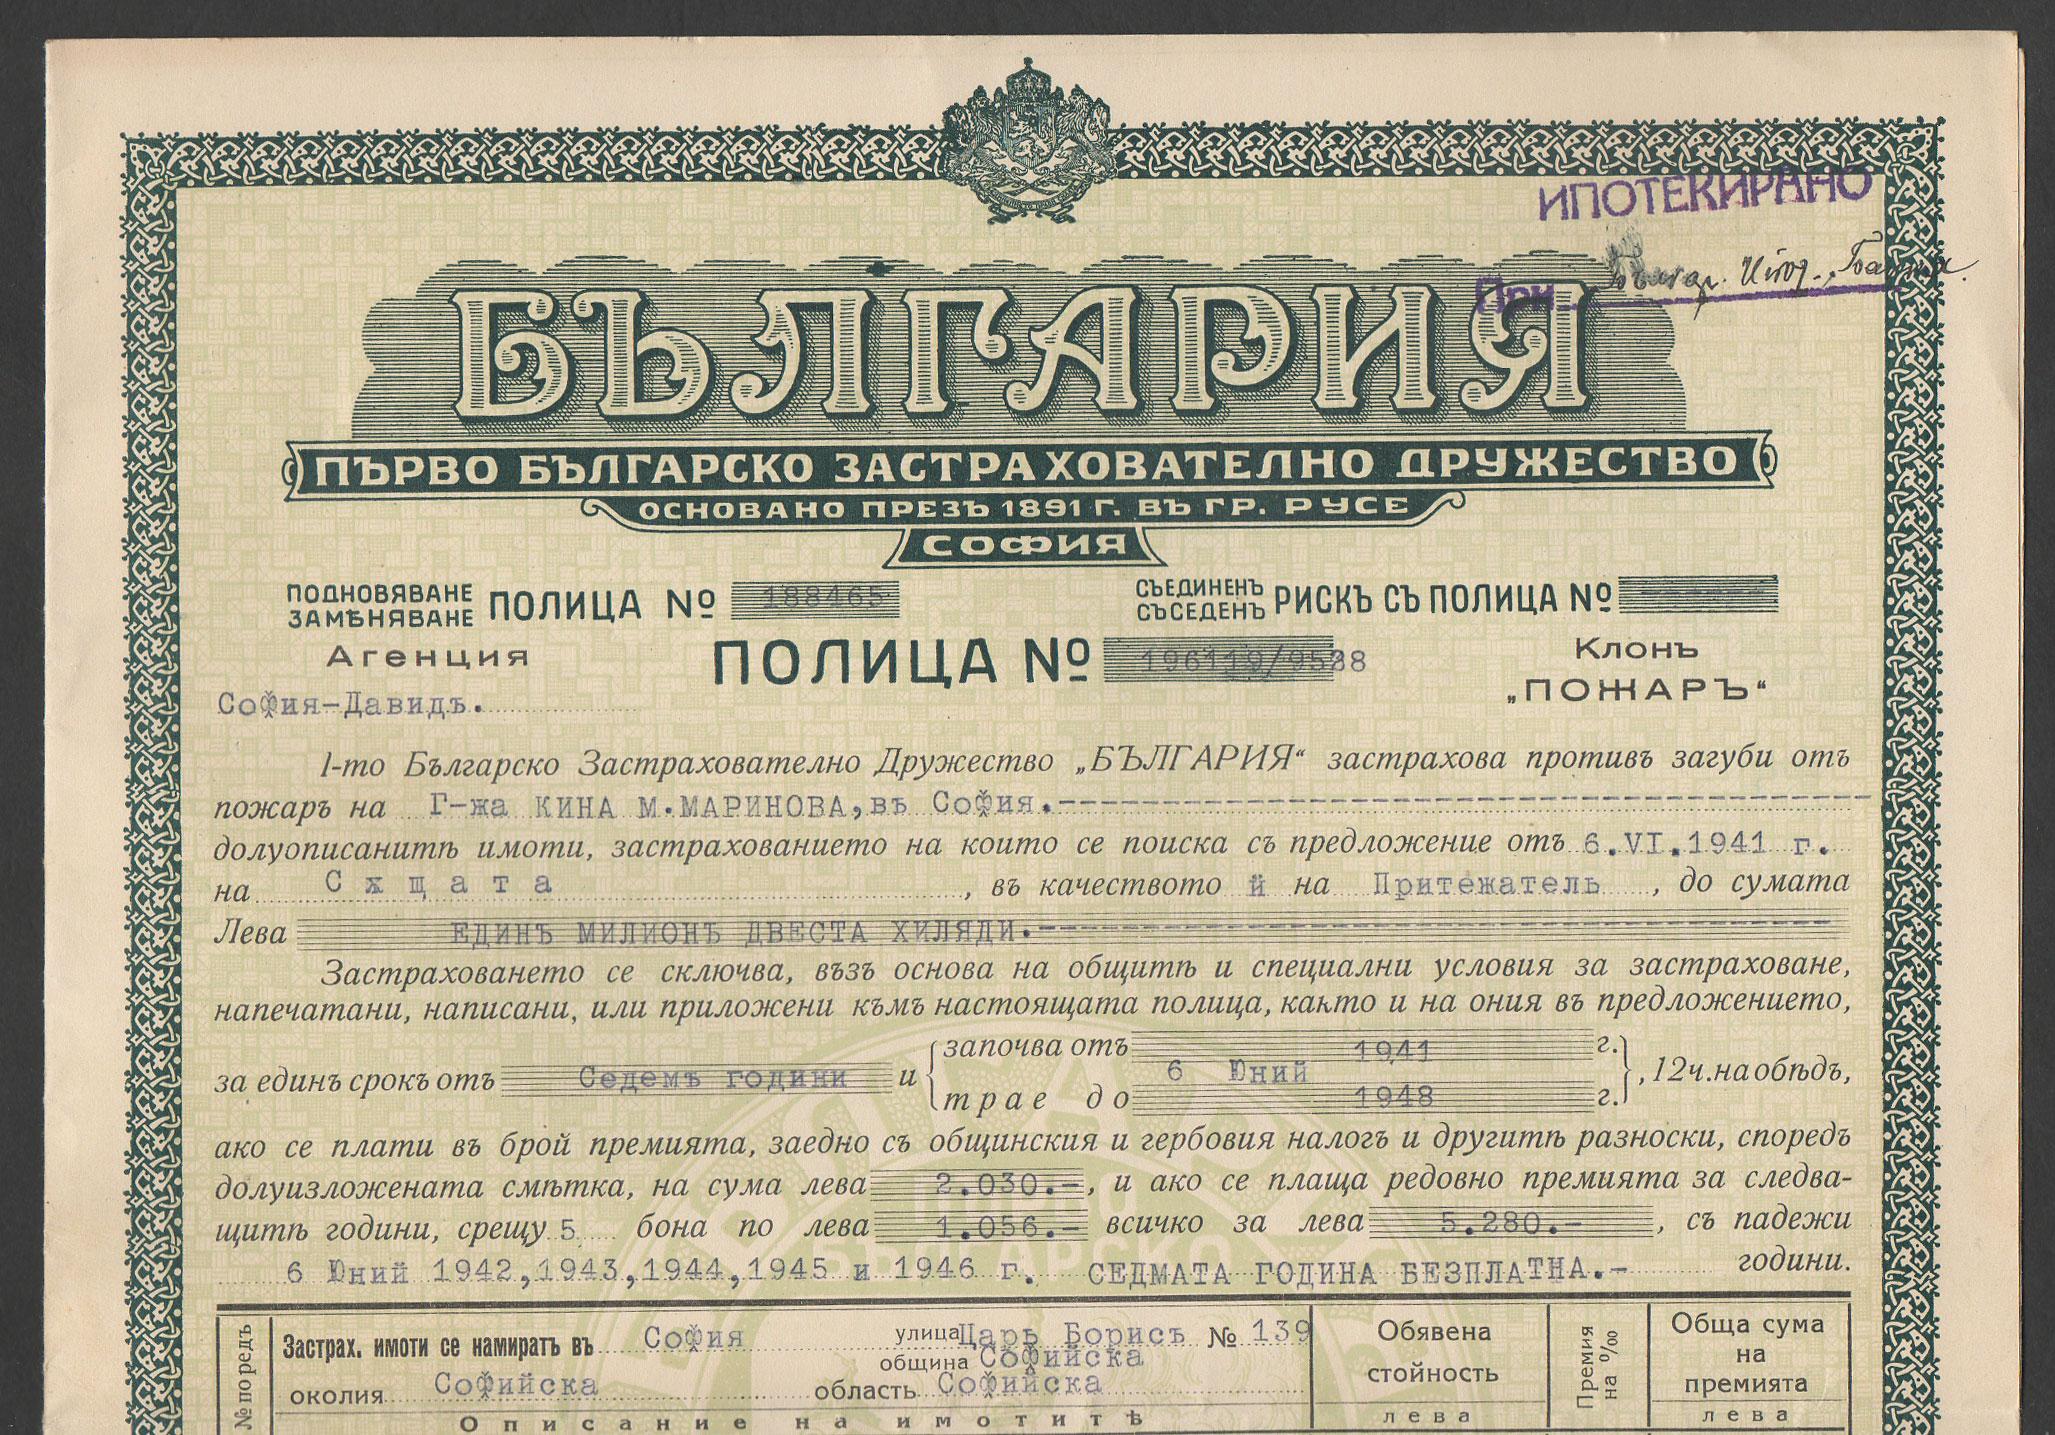 Bulgaria 1941 WW2 Lot Insurance Certificate Of Death